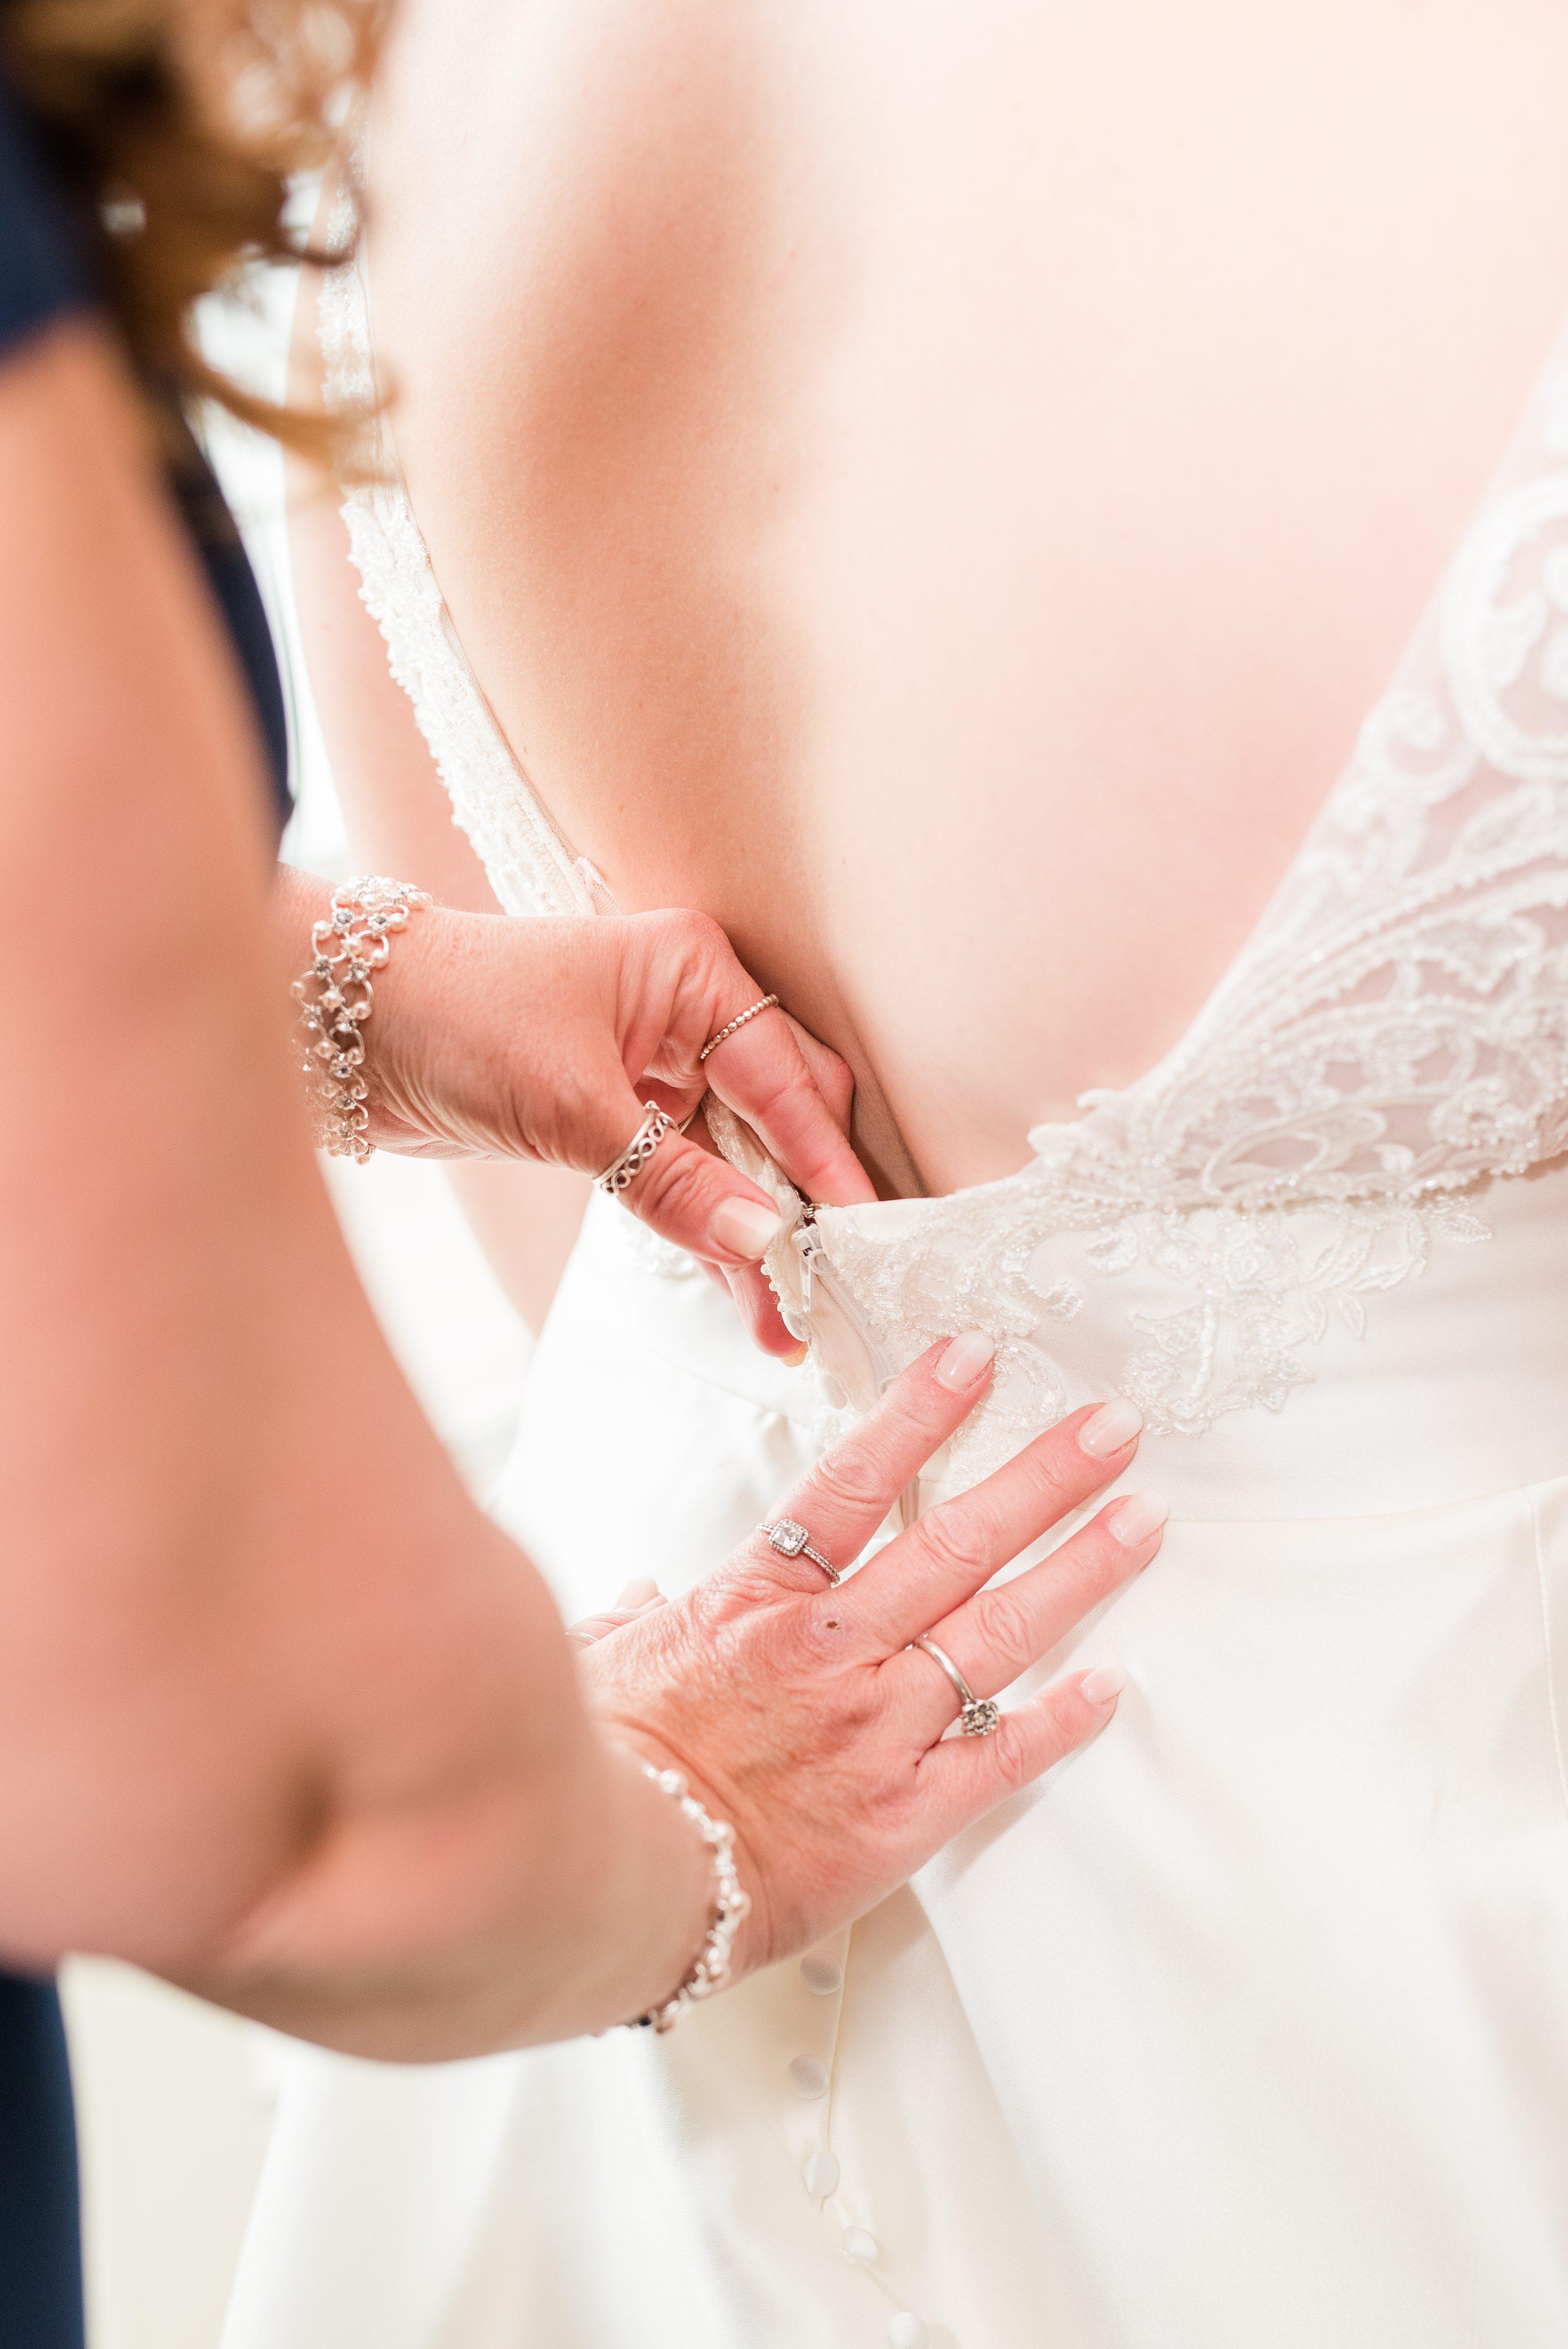 Blue Ridge Mountains,Edgewood,brides dress,mother of bride,wedding dress buttons